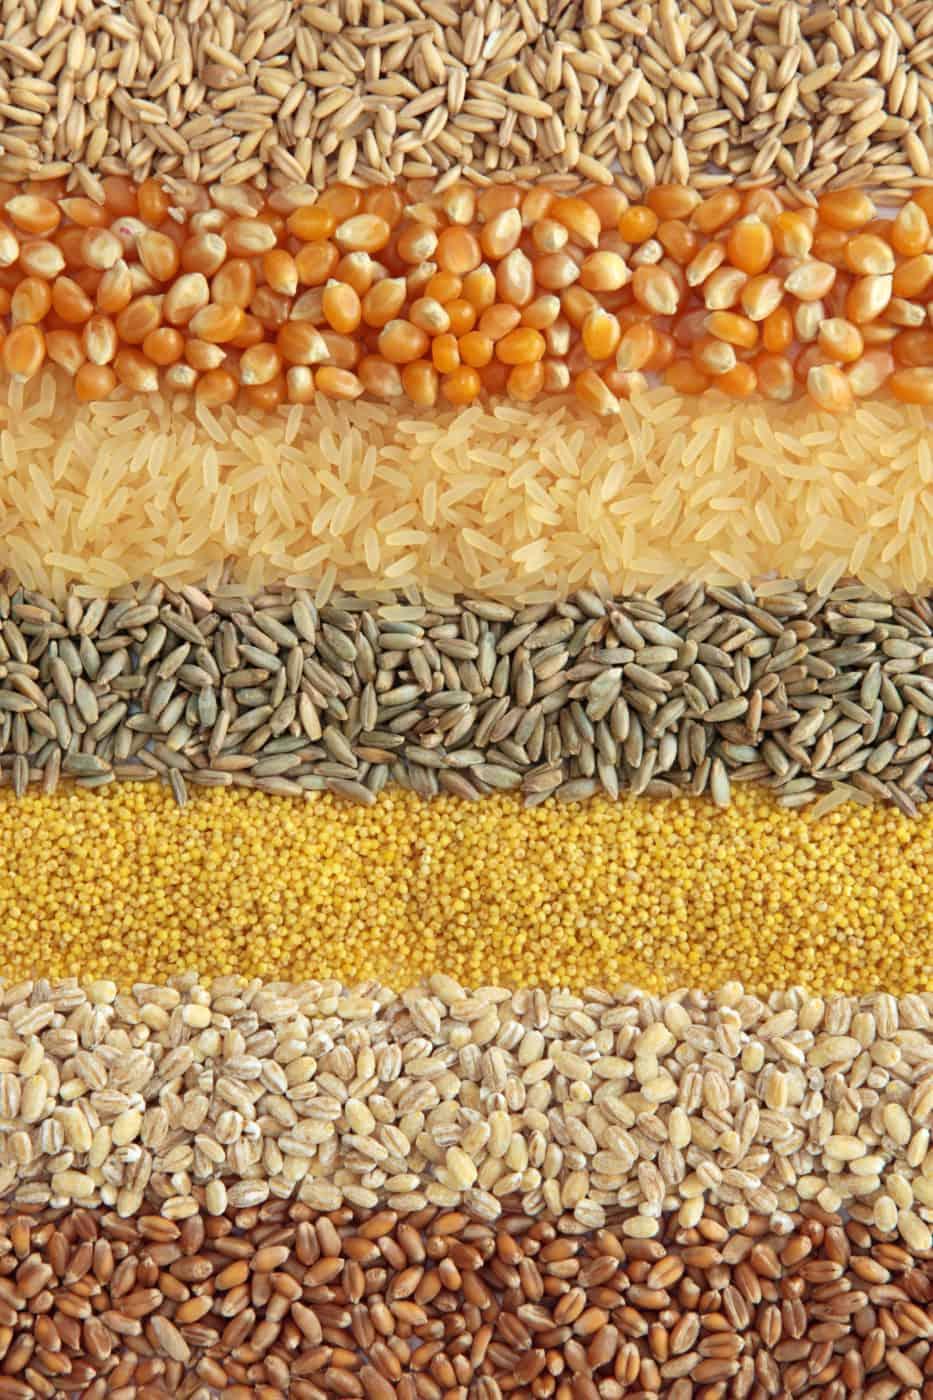 Whole Grain Foods Grocery List